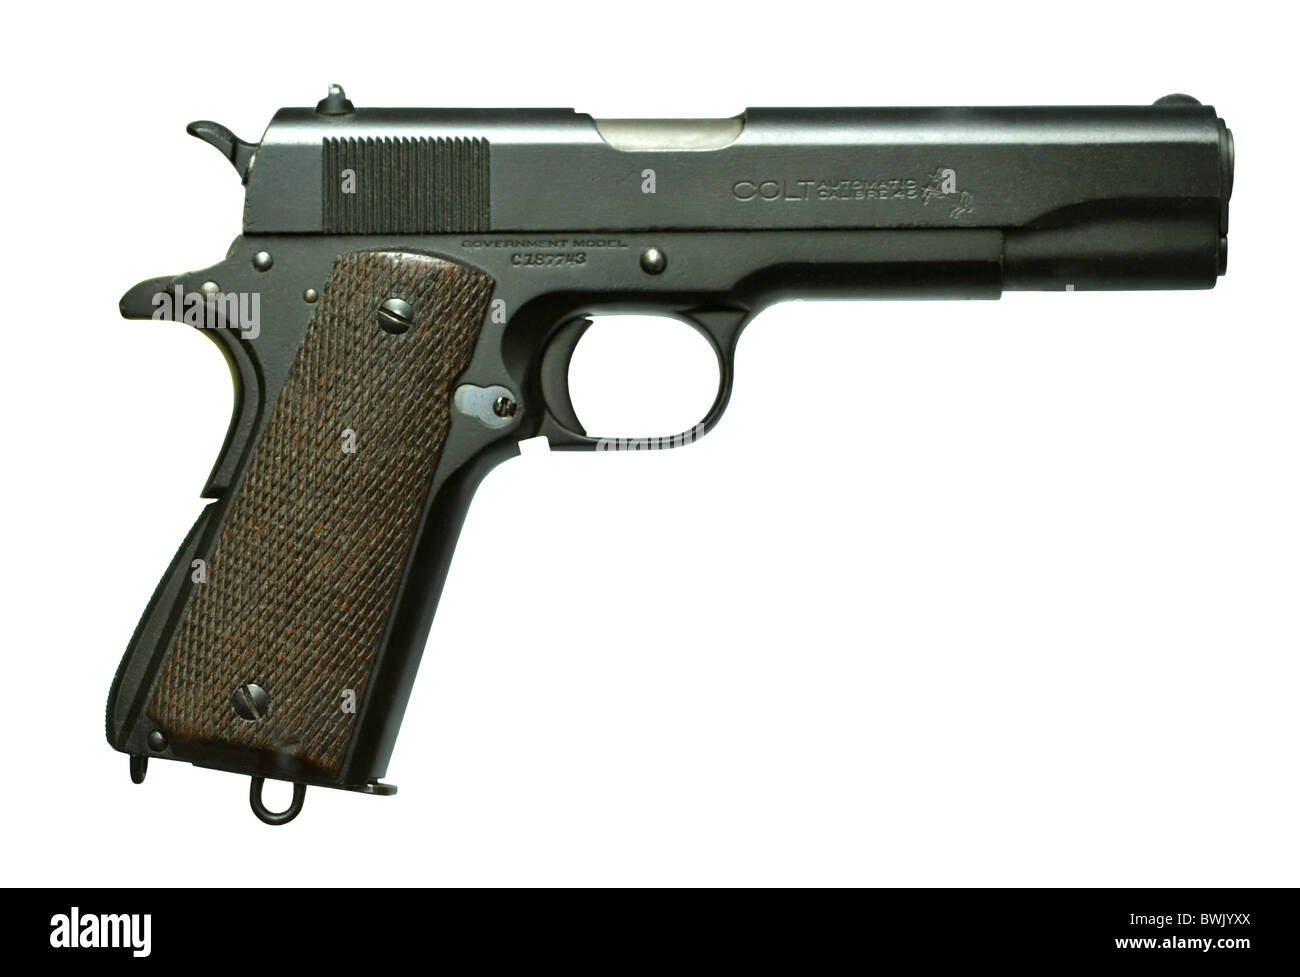 Colt Semi Automatic Pistol .45 calibre M1911A - Stock Image